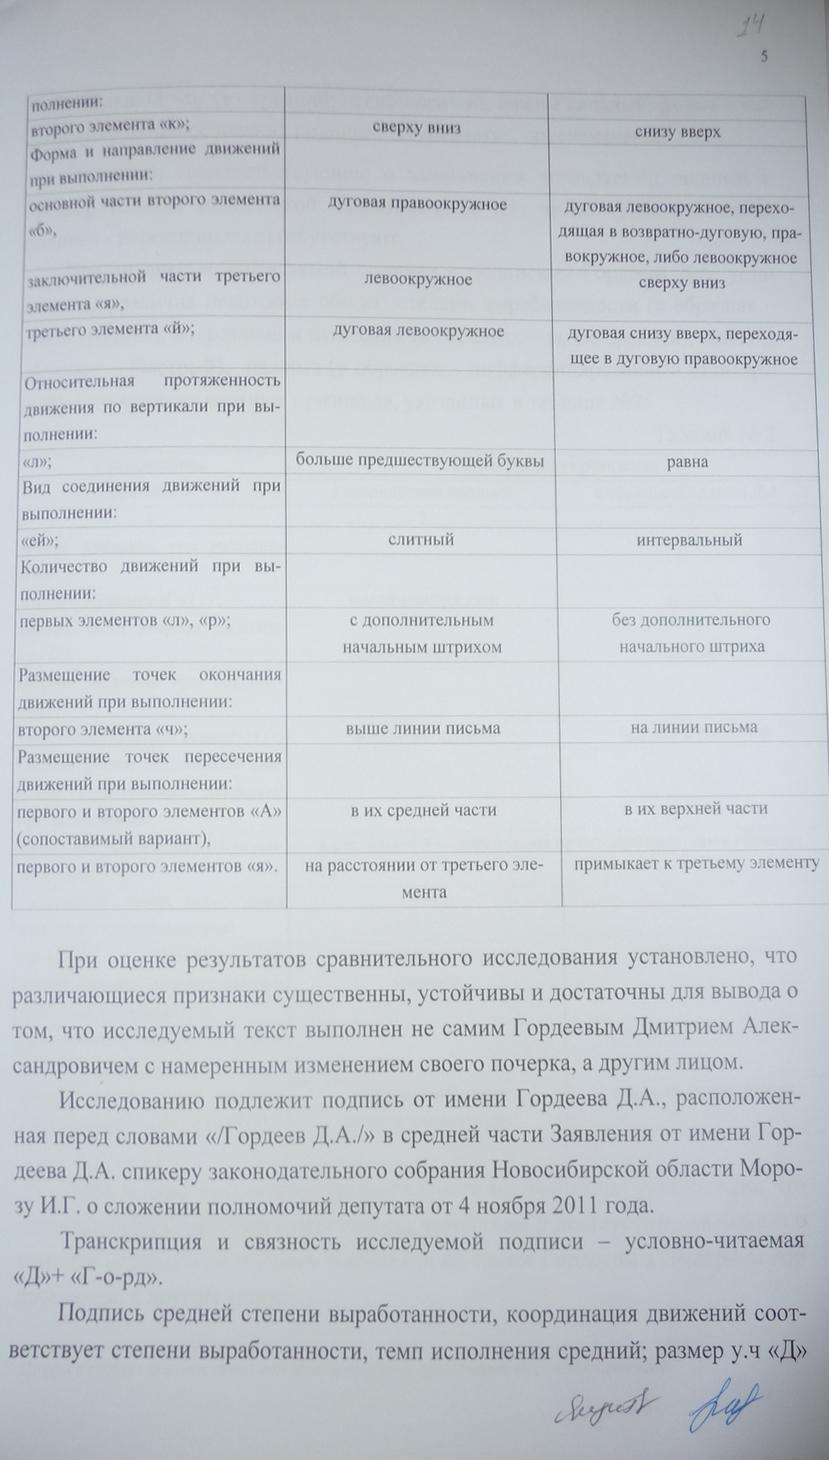 dc20130317_05